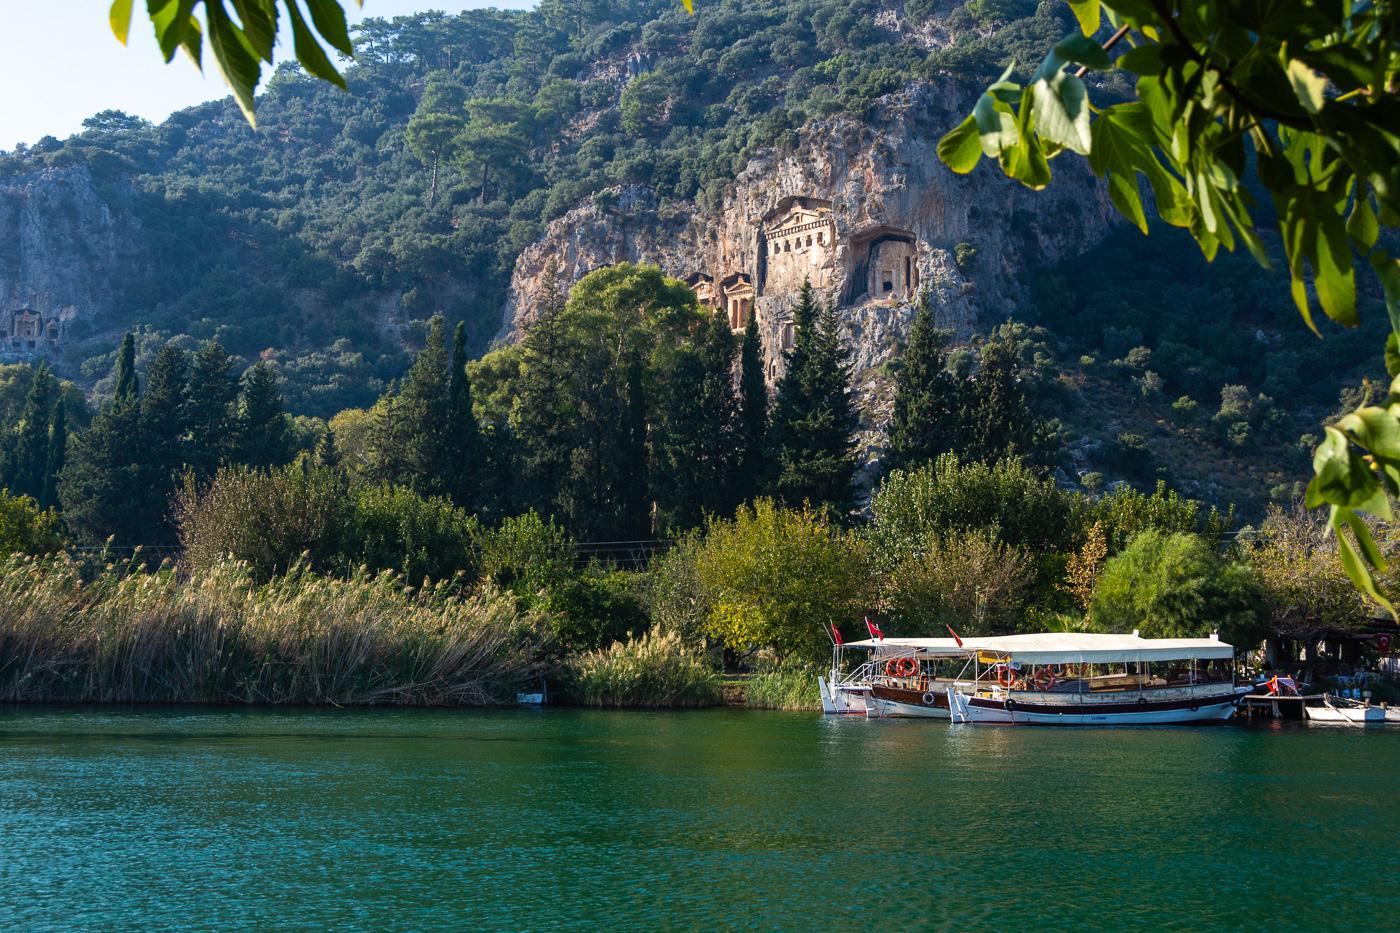 Turkey Aegean road trip: Akyaka to Fethiye